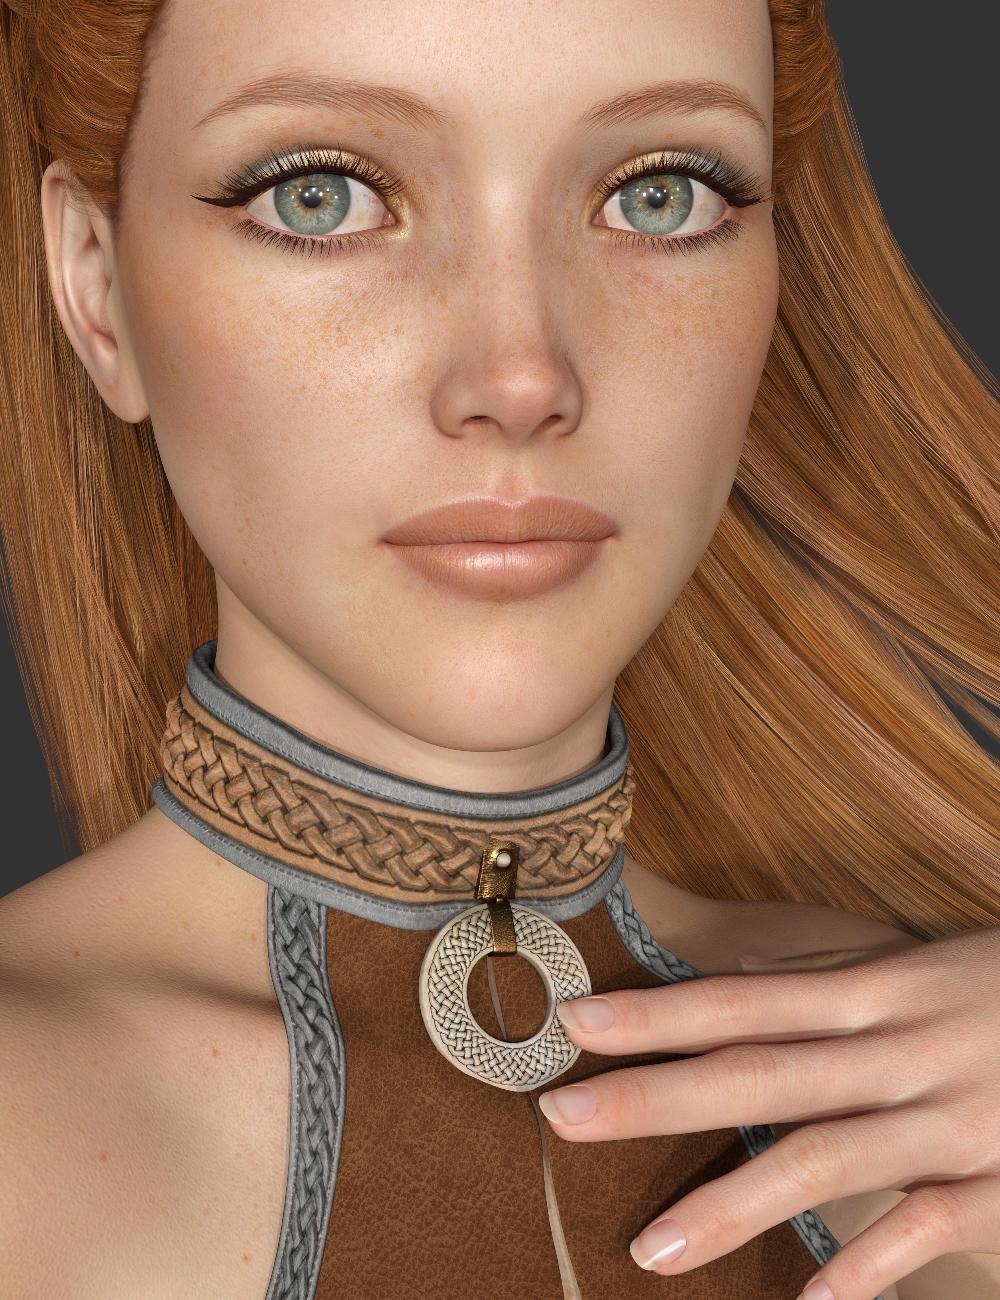 Eryn for Genesis 8 Female by: Handspan Studios, 3D Models by Daz 3D